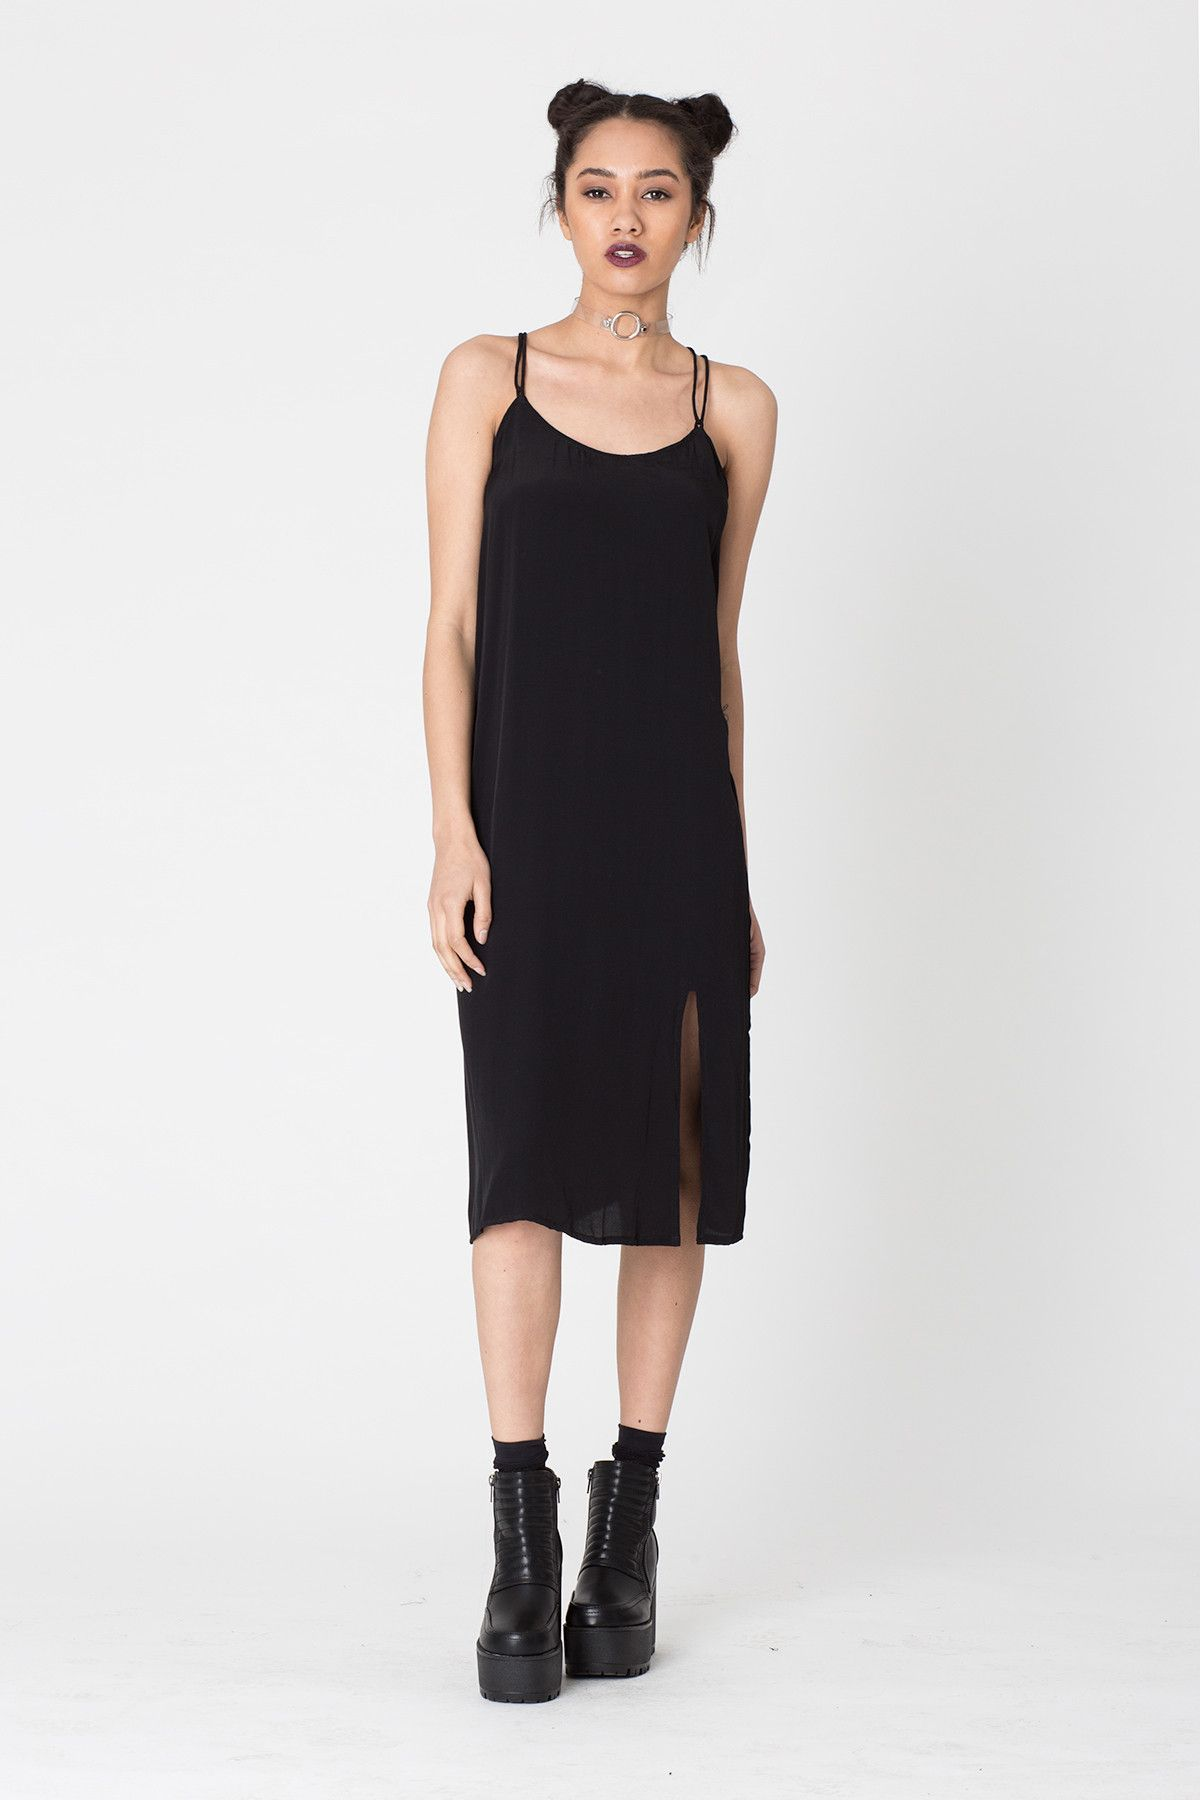 black slip dress - Google Search | My college clothes list ...